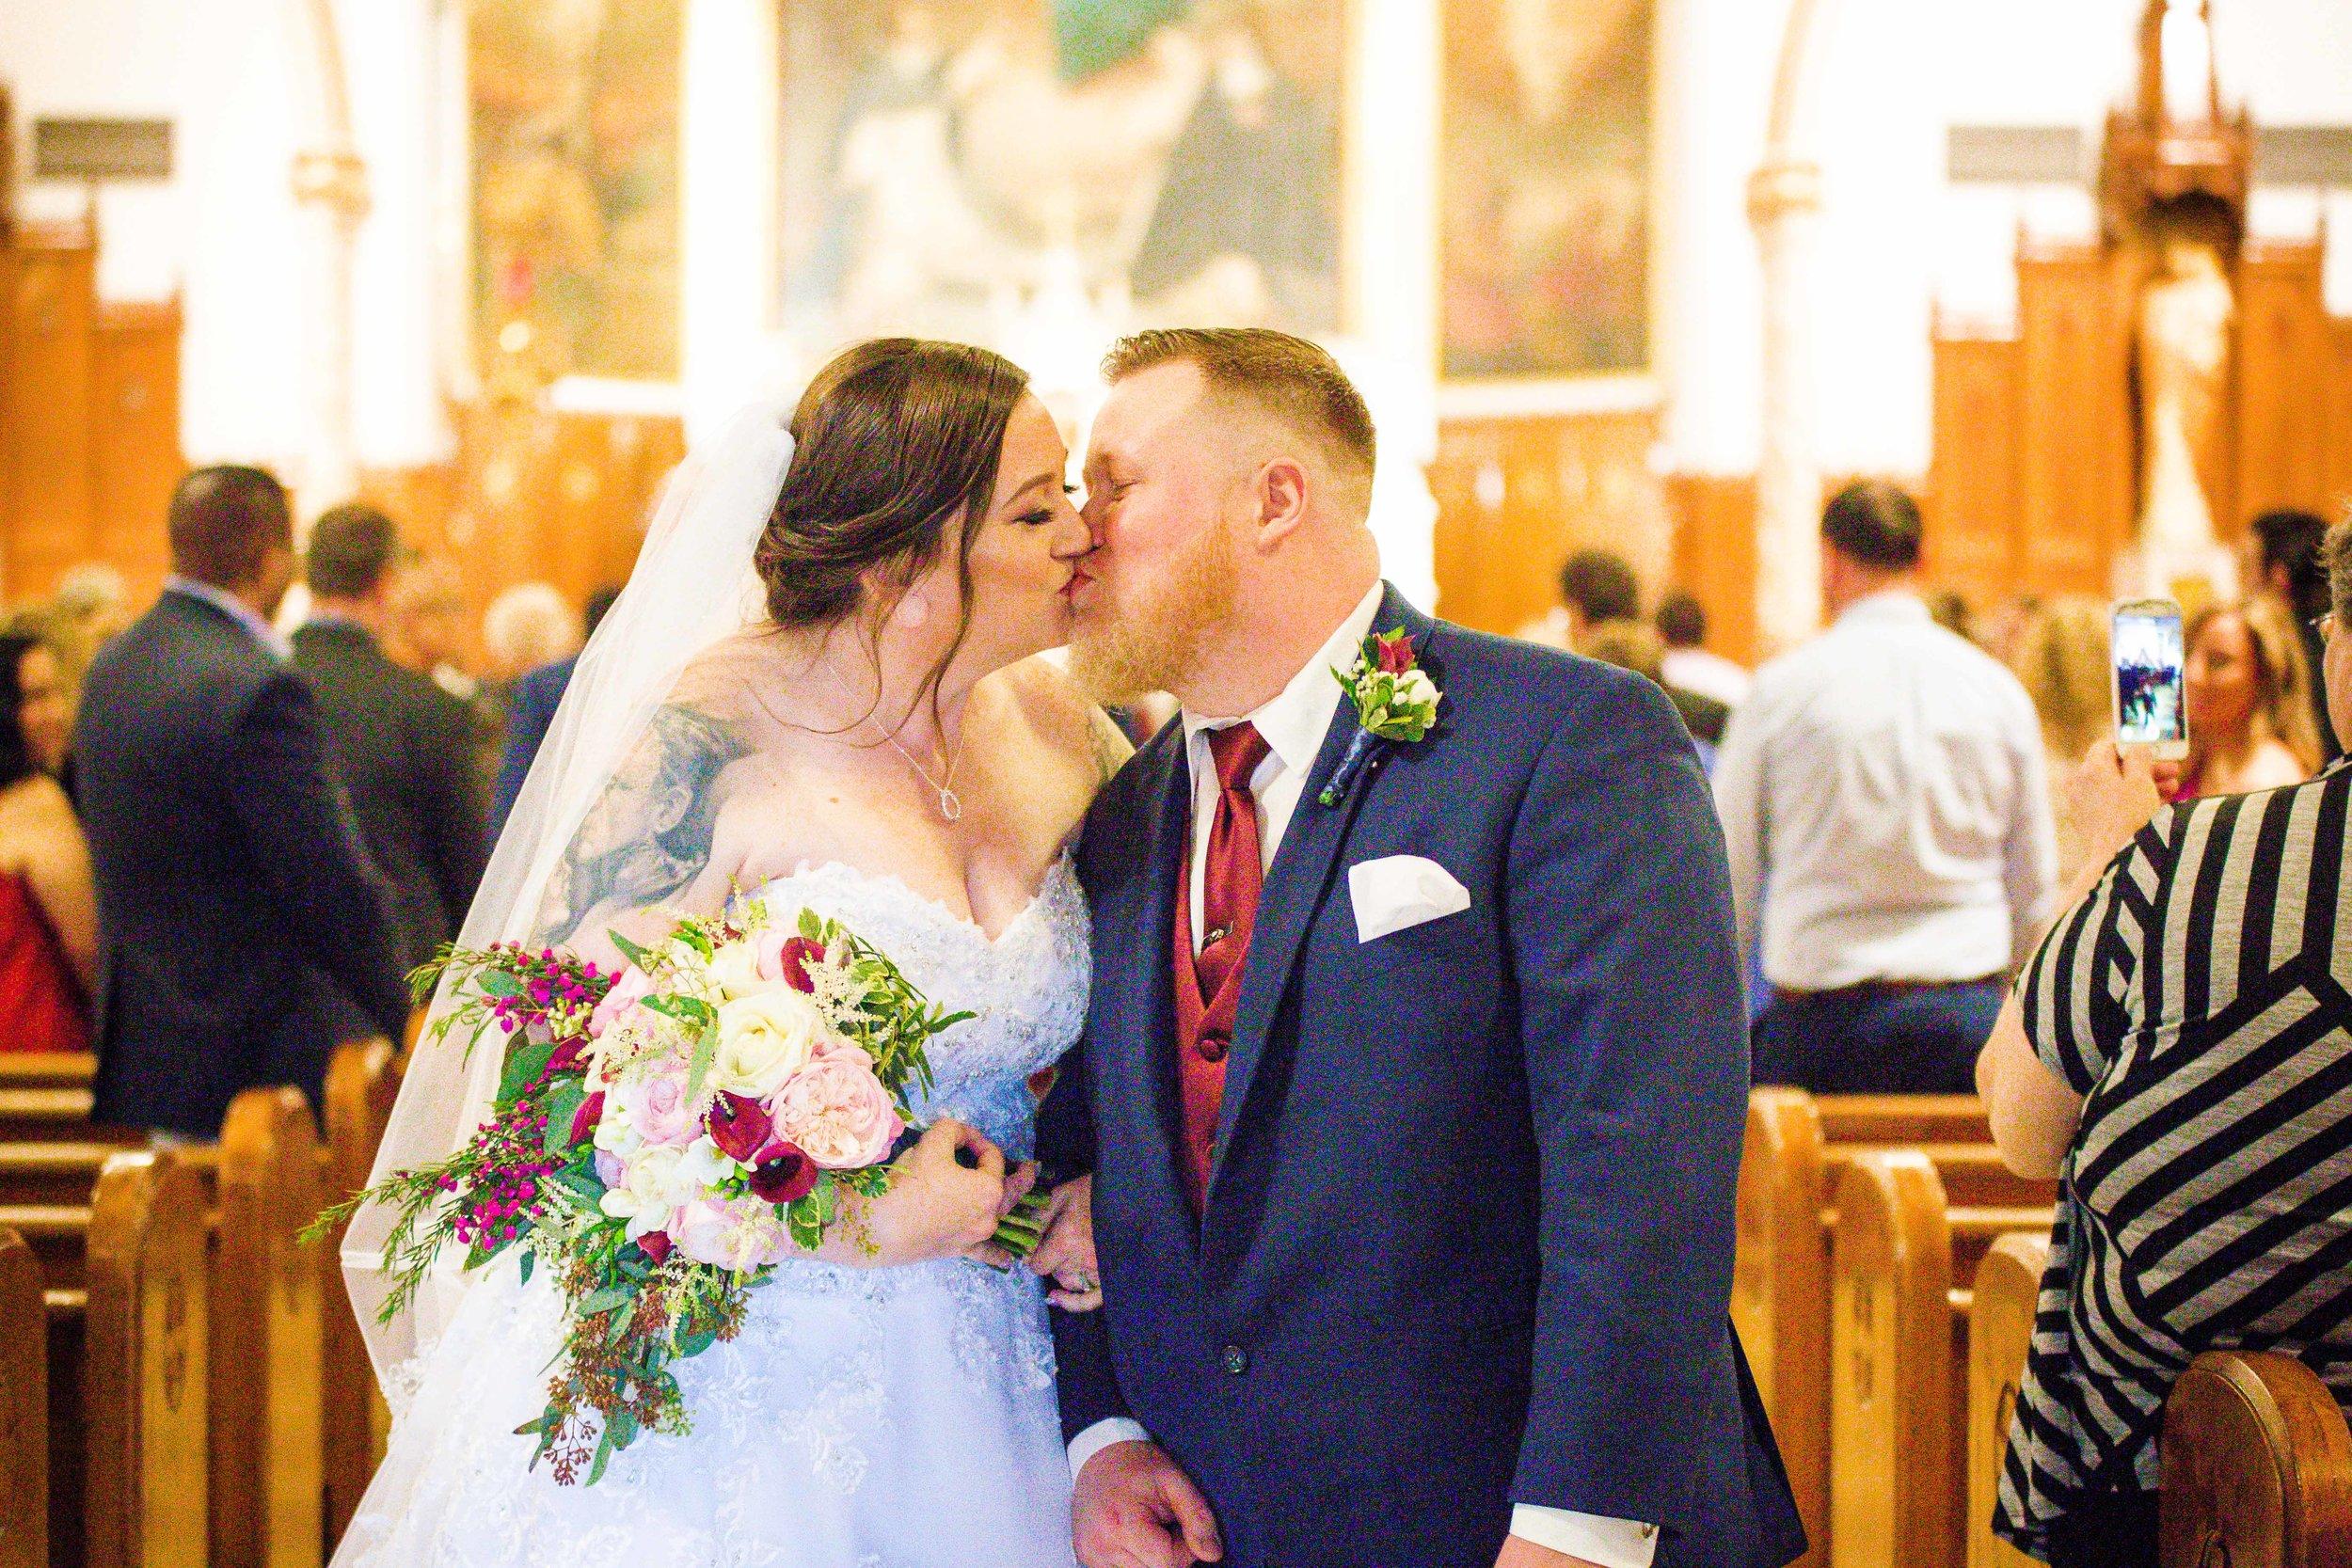 KRISTINA AND SHAWN - WATERFALL ROOM WEDDING - PHILADELPHIA-64.jpg